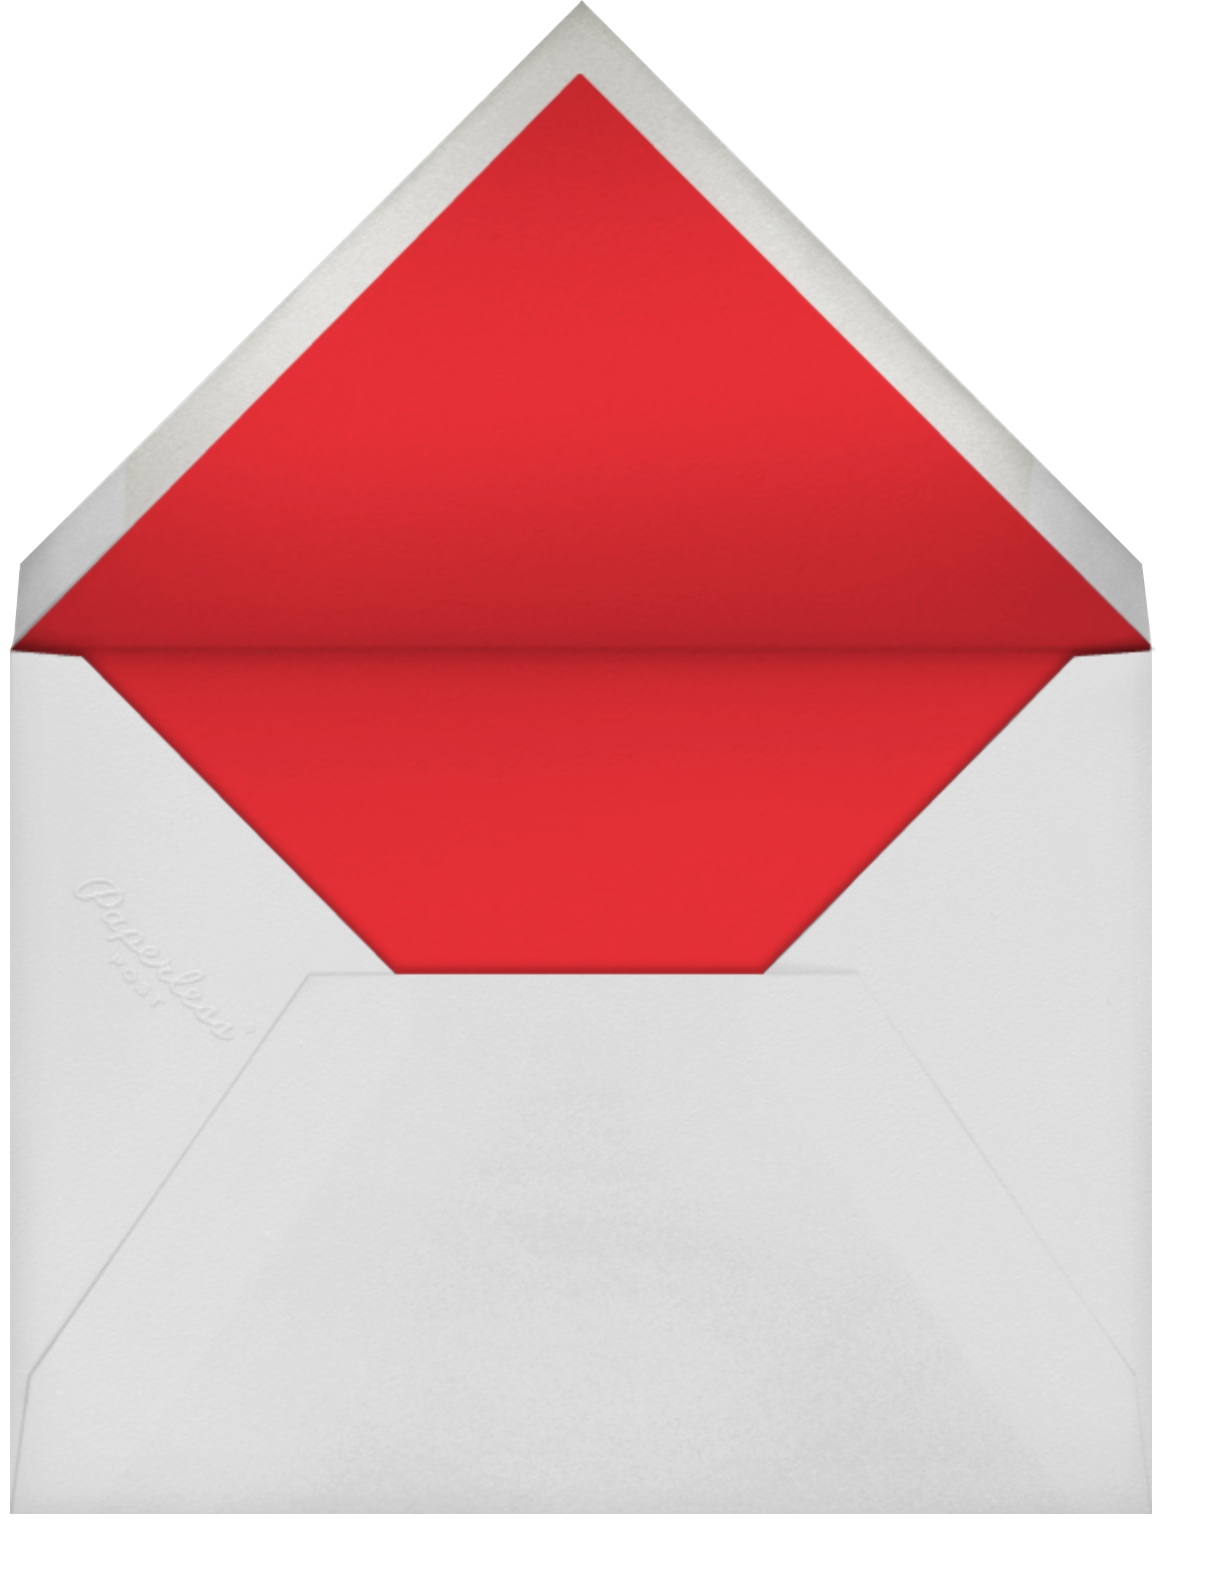 Candy Cane Crosshatch - kate spade new york - Christmas - envelope back